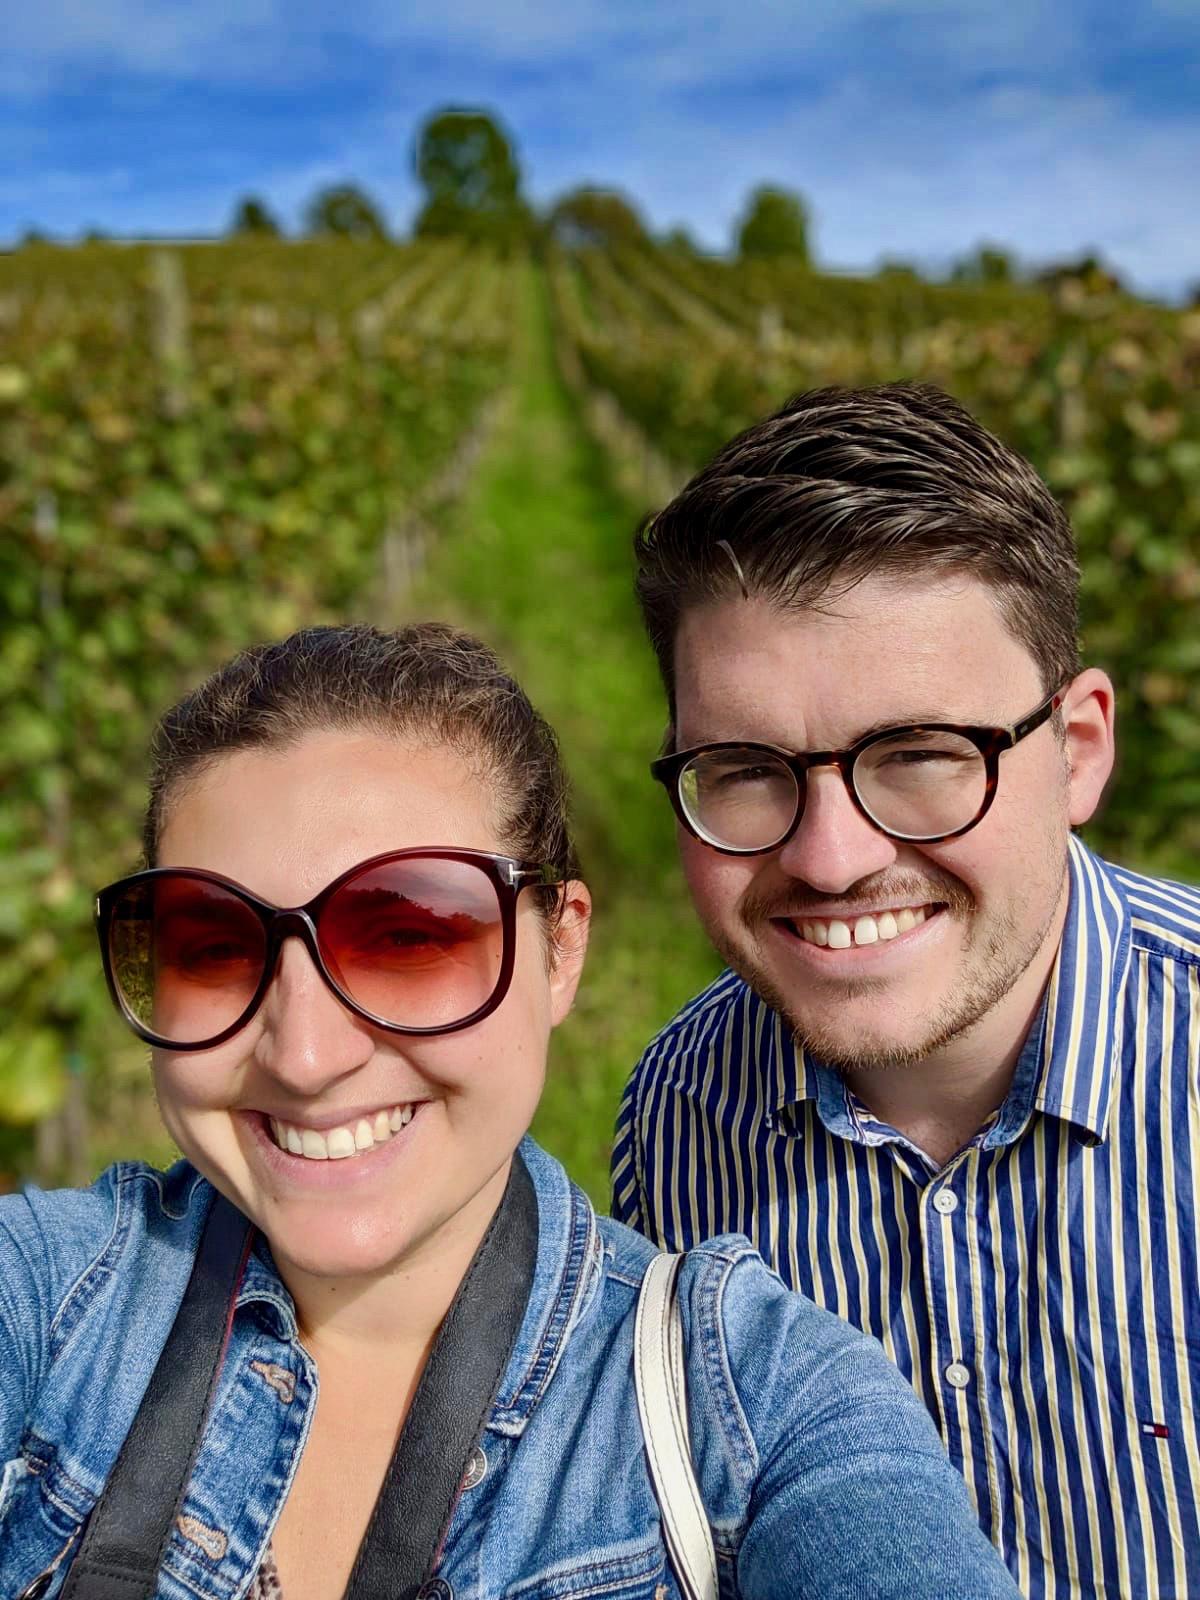 Selfie of couple in Vineyard at Chateau Ramsak in slovenia